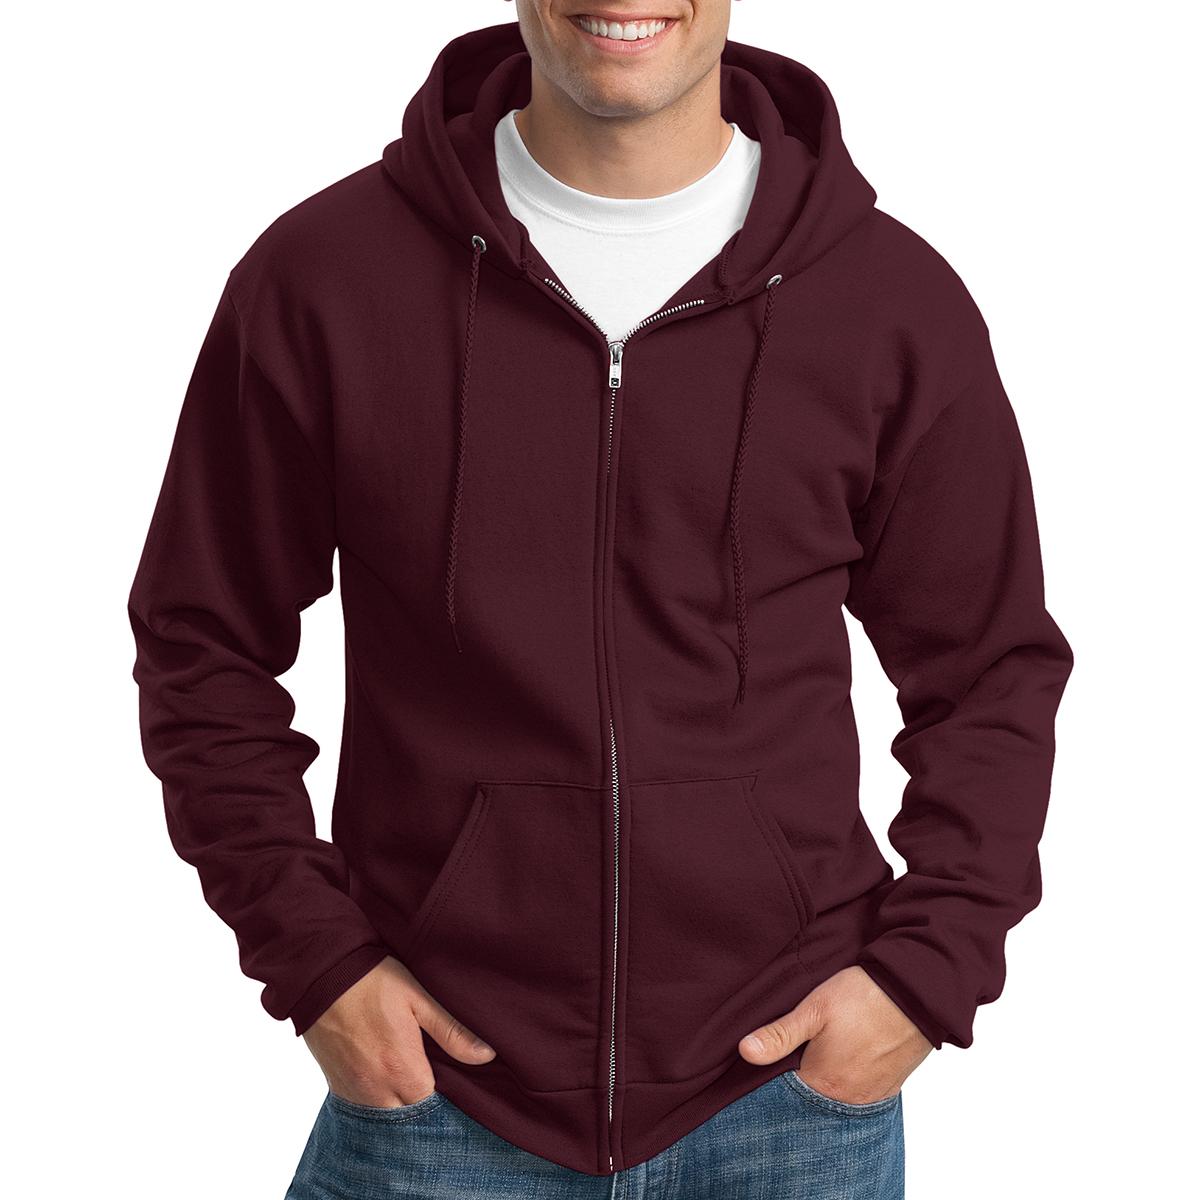 Core Fleece Full-Zip Hooded Sweatshirt Port /& Company PC78ZH Heather Red XL